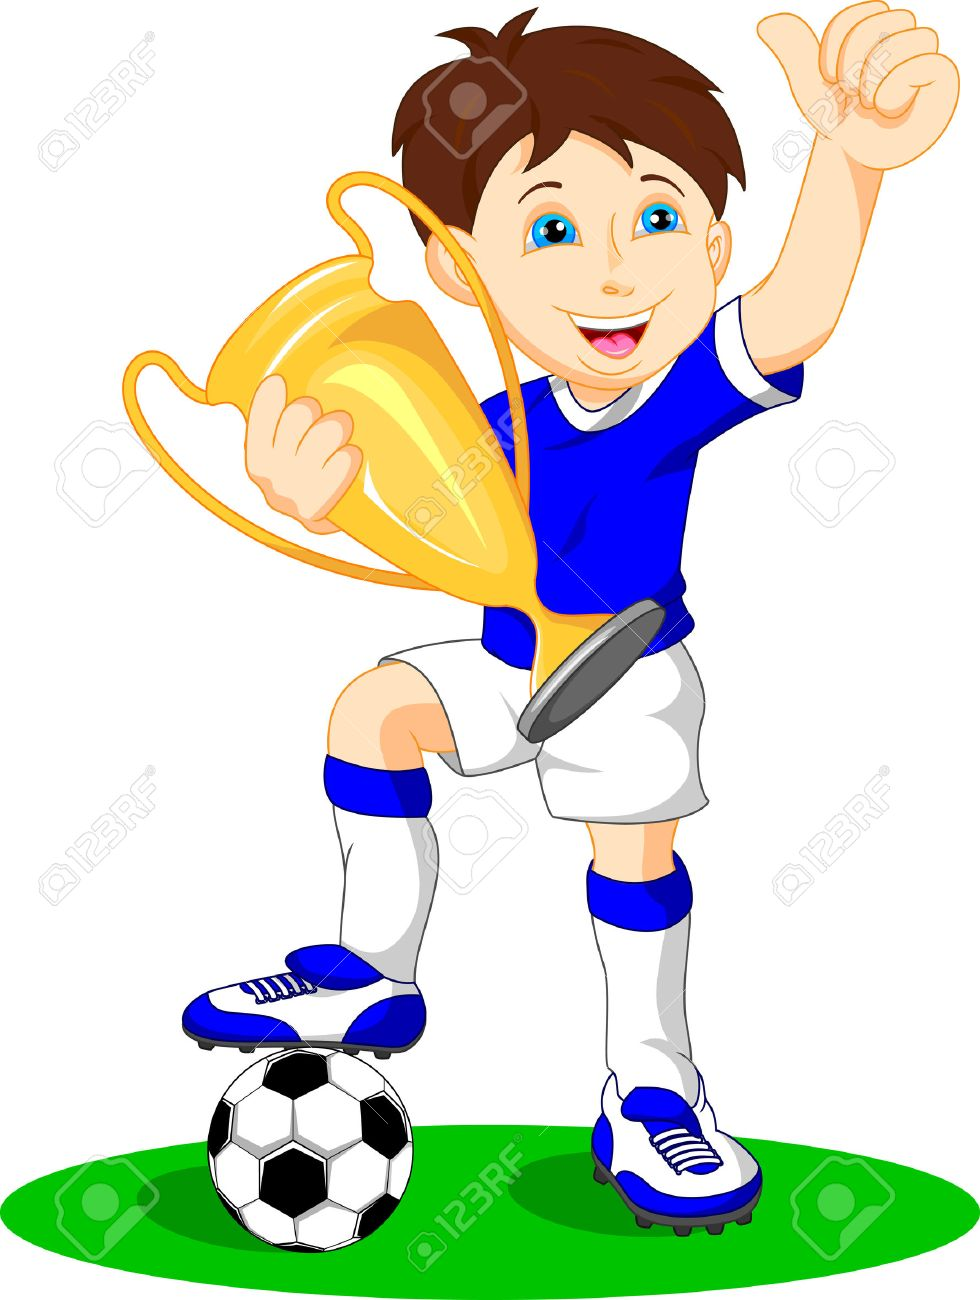 footballer clipart 4